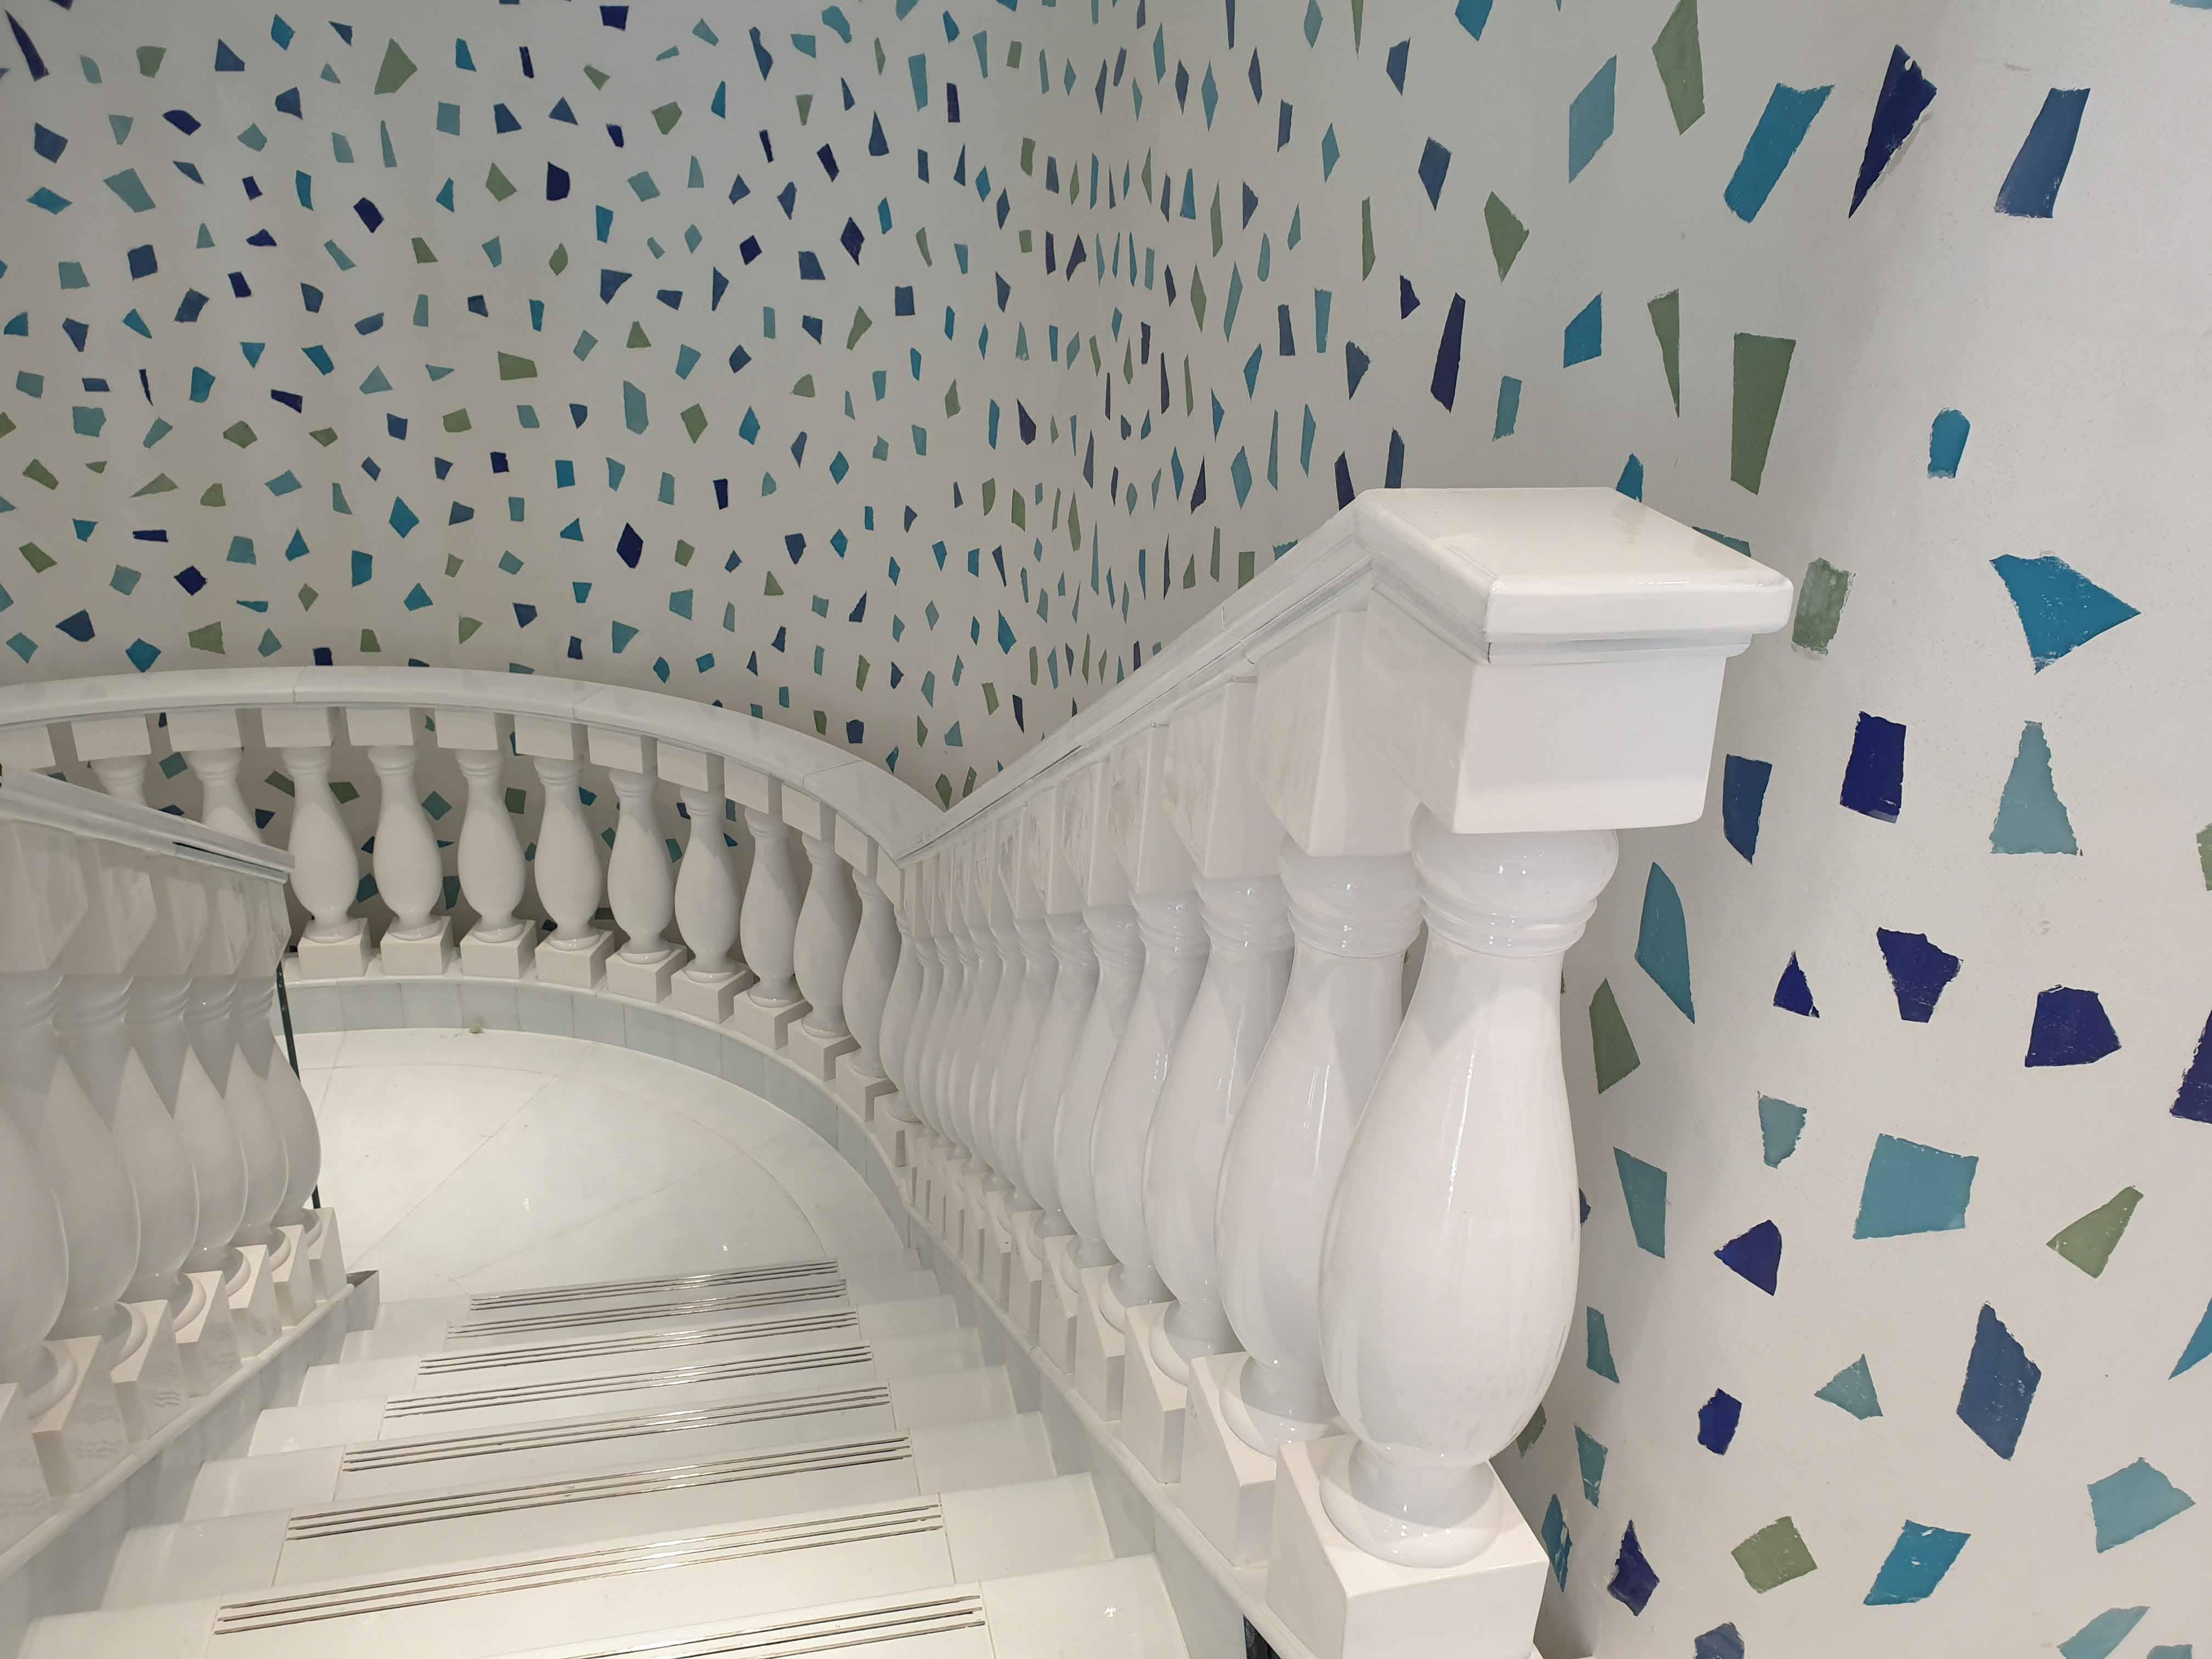 Escalera Dolce y Gabbana